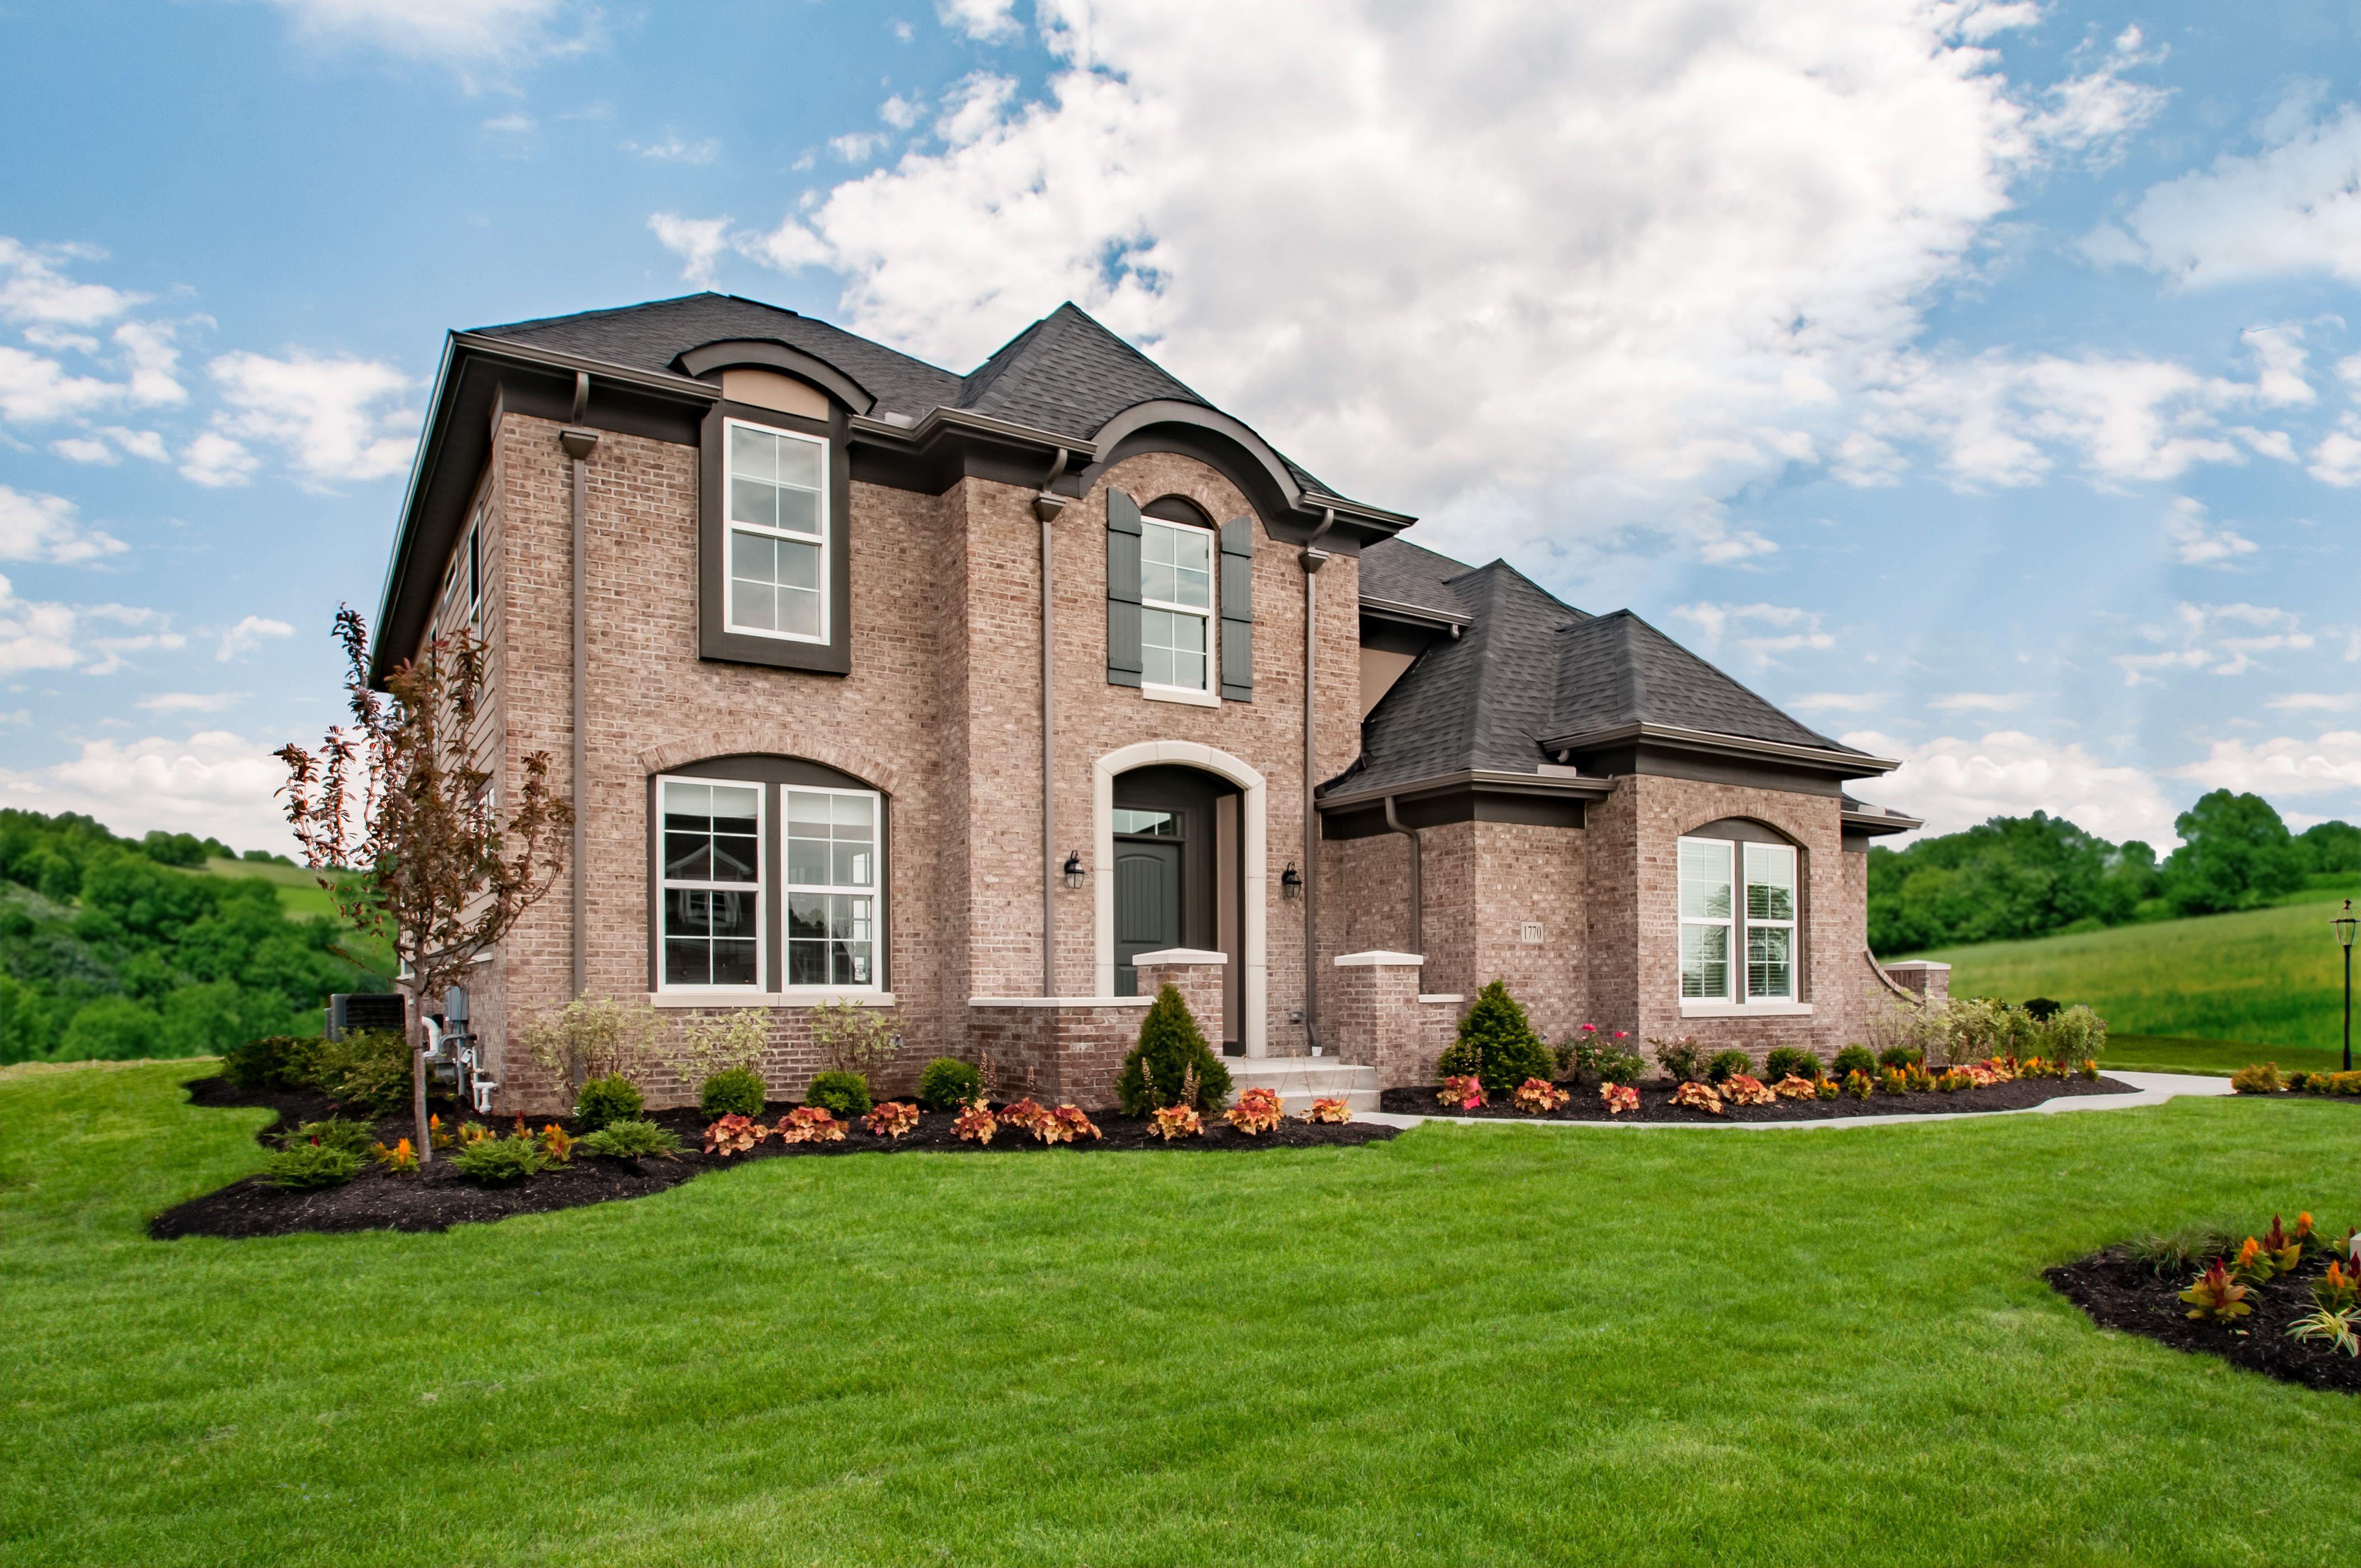 'Reserve at Meadowood' by Fischer Homes  in Cincinnati